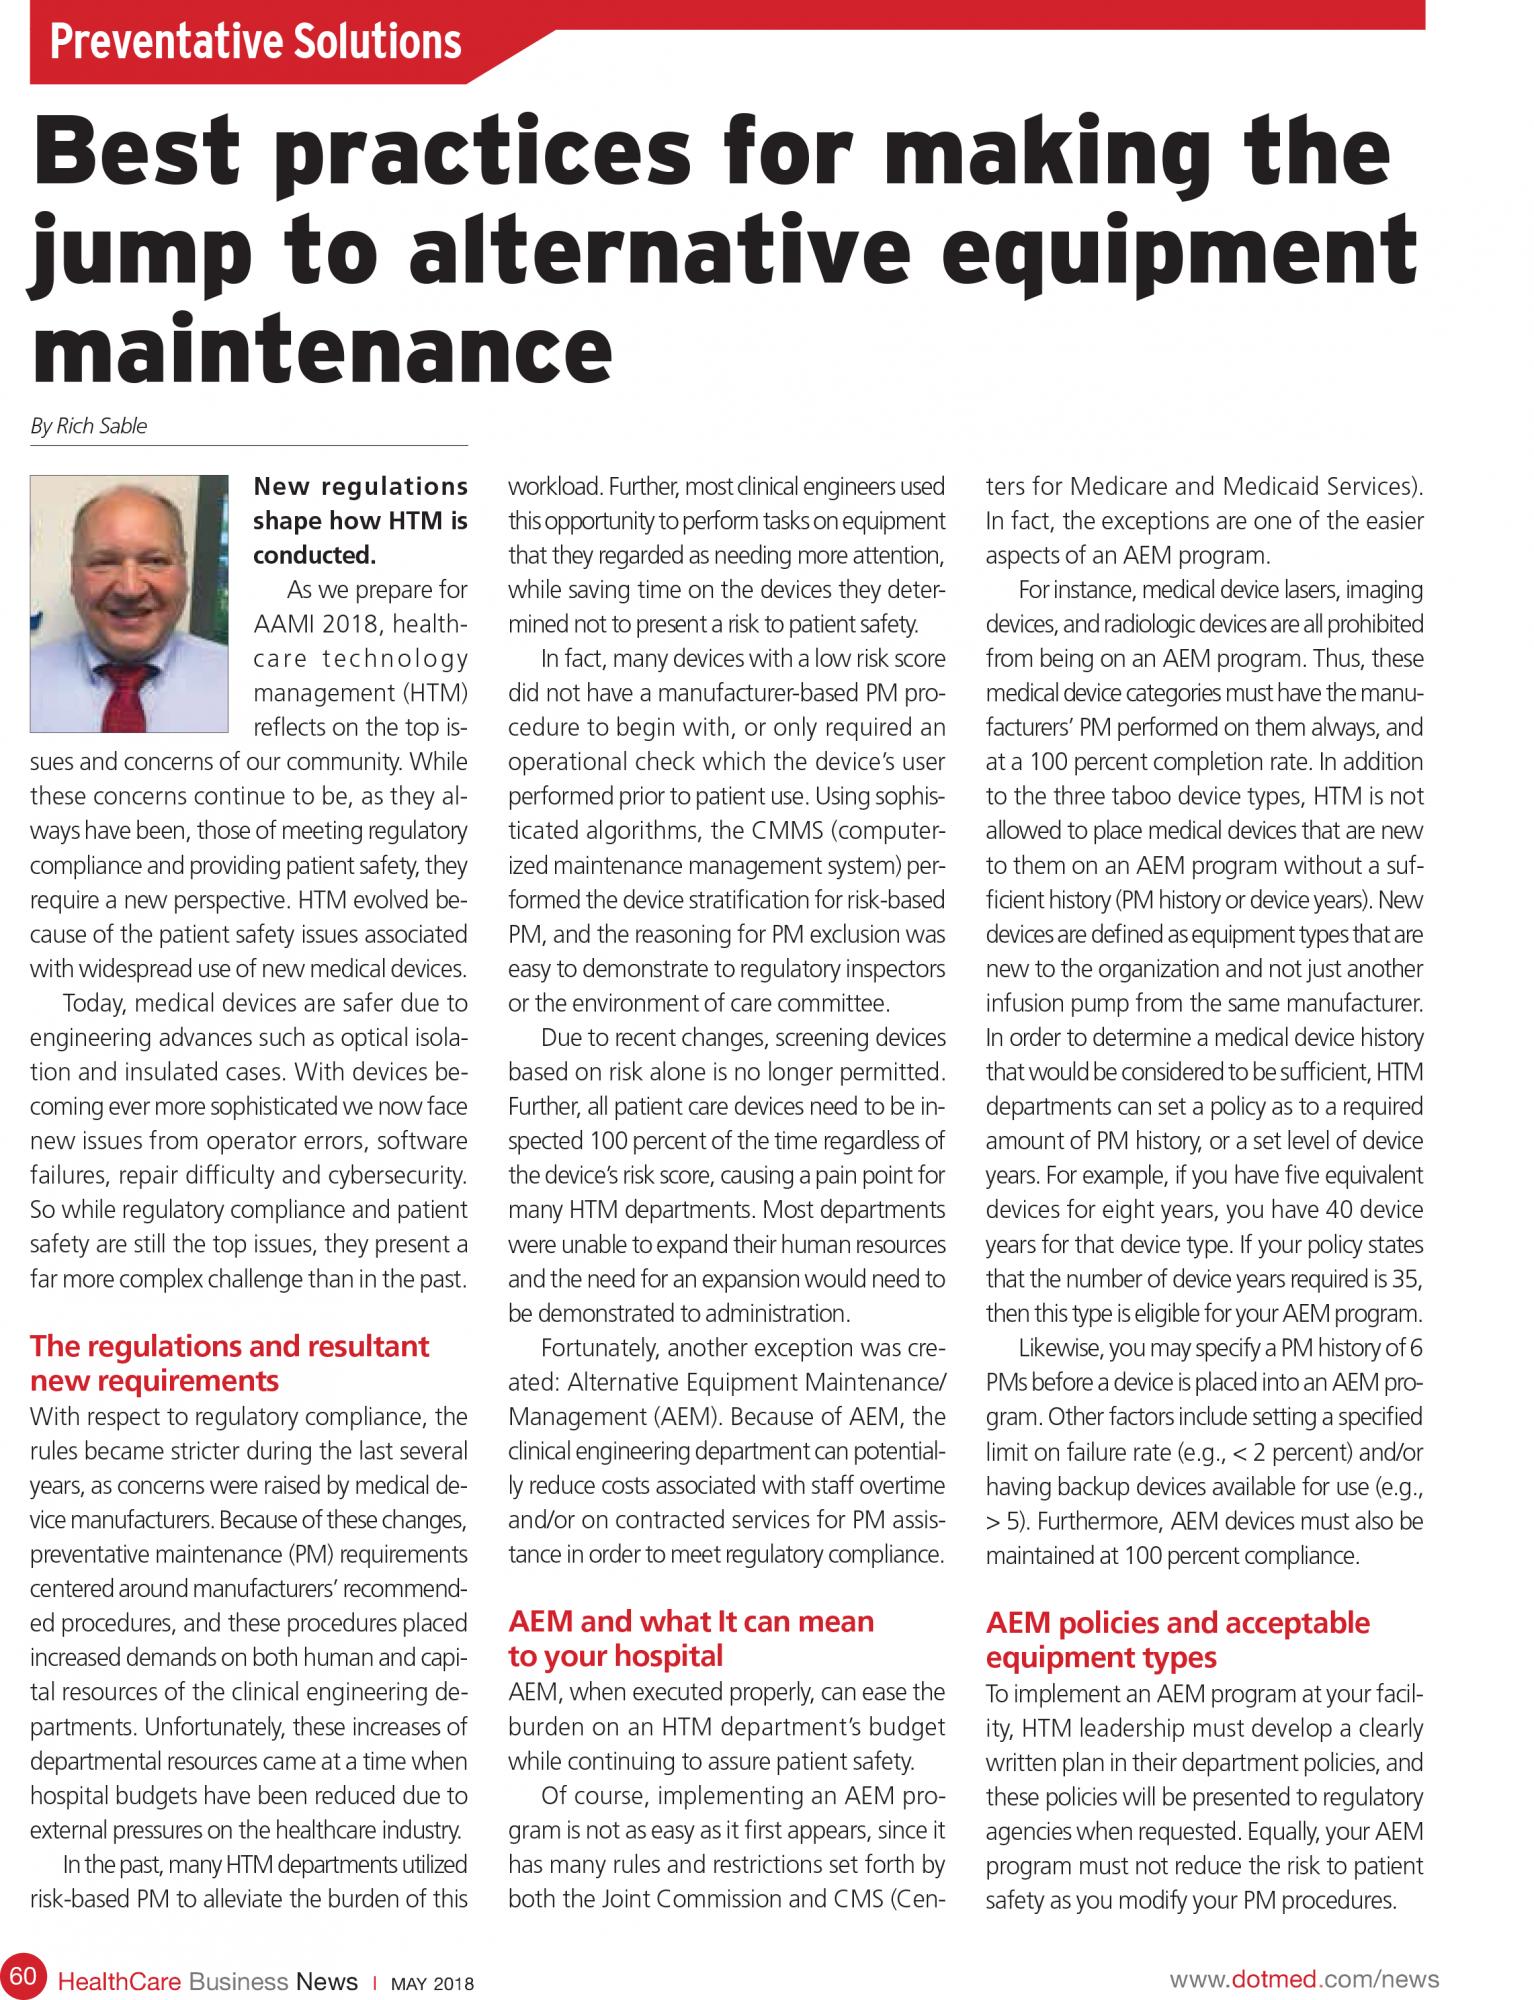 alternative equipment maintenance best practices